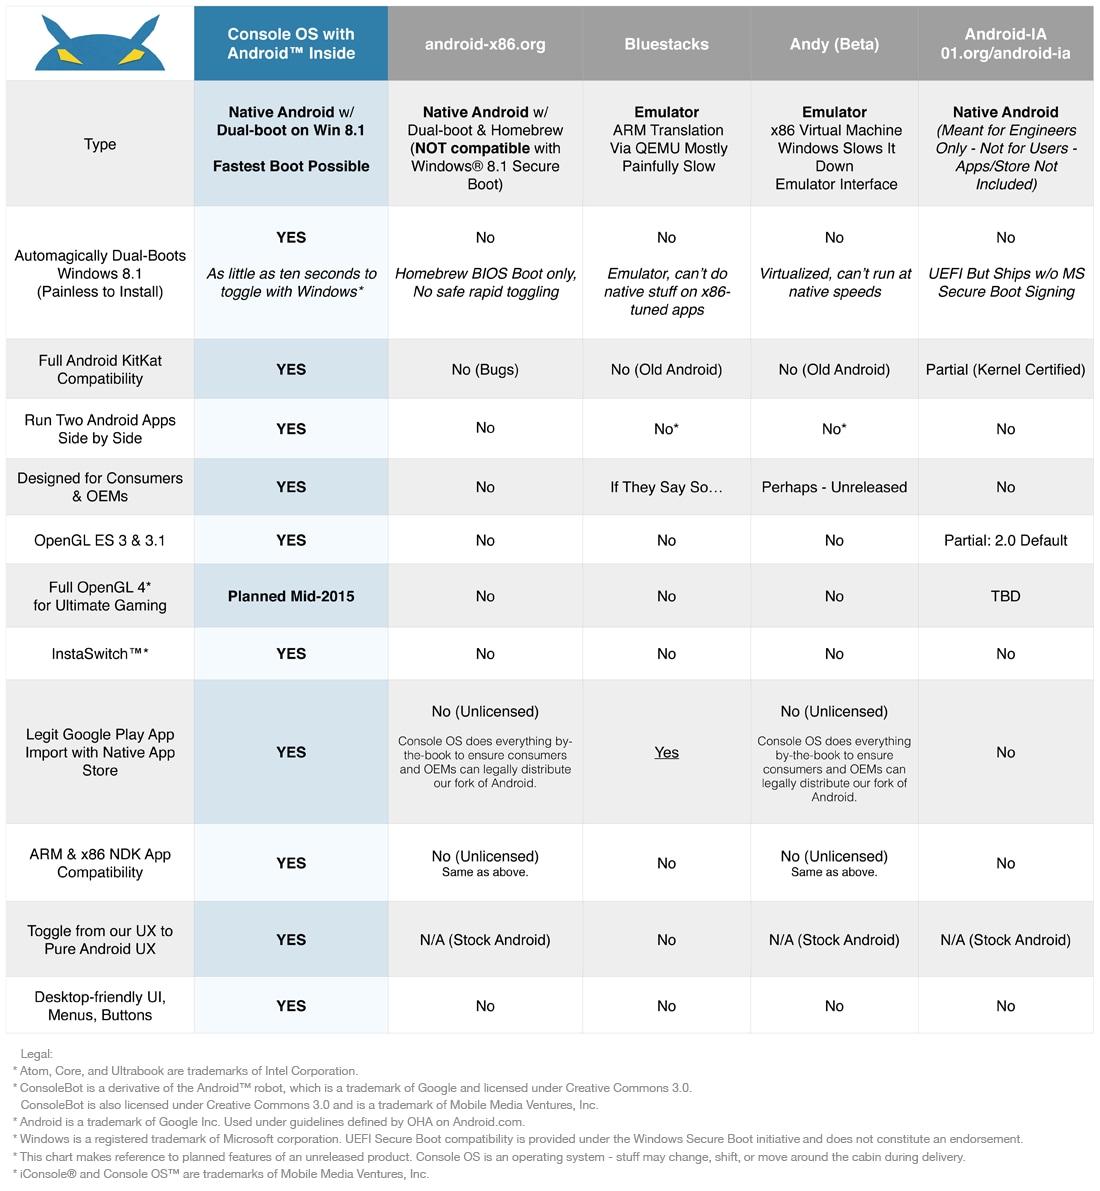 comparativa console OS